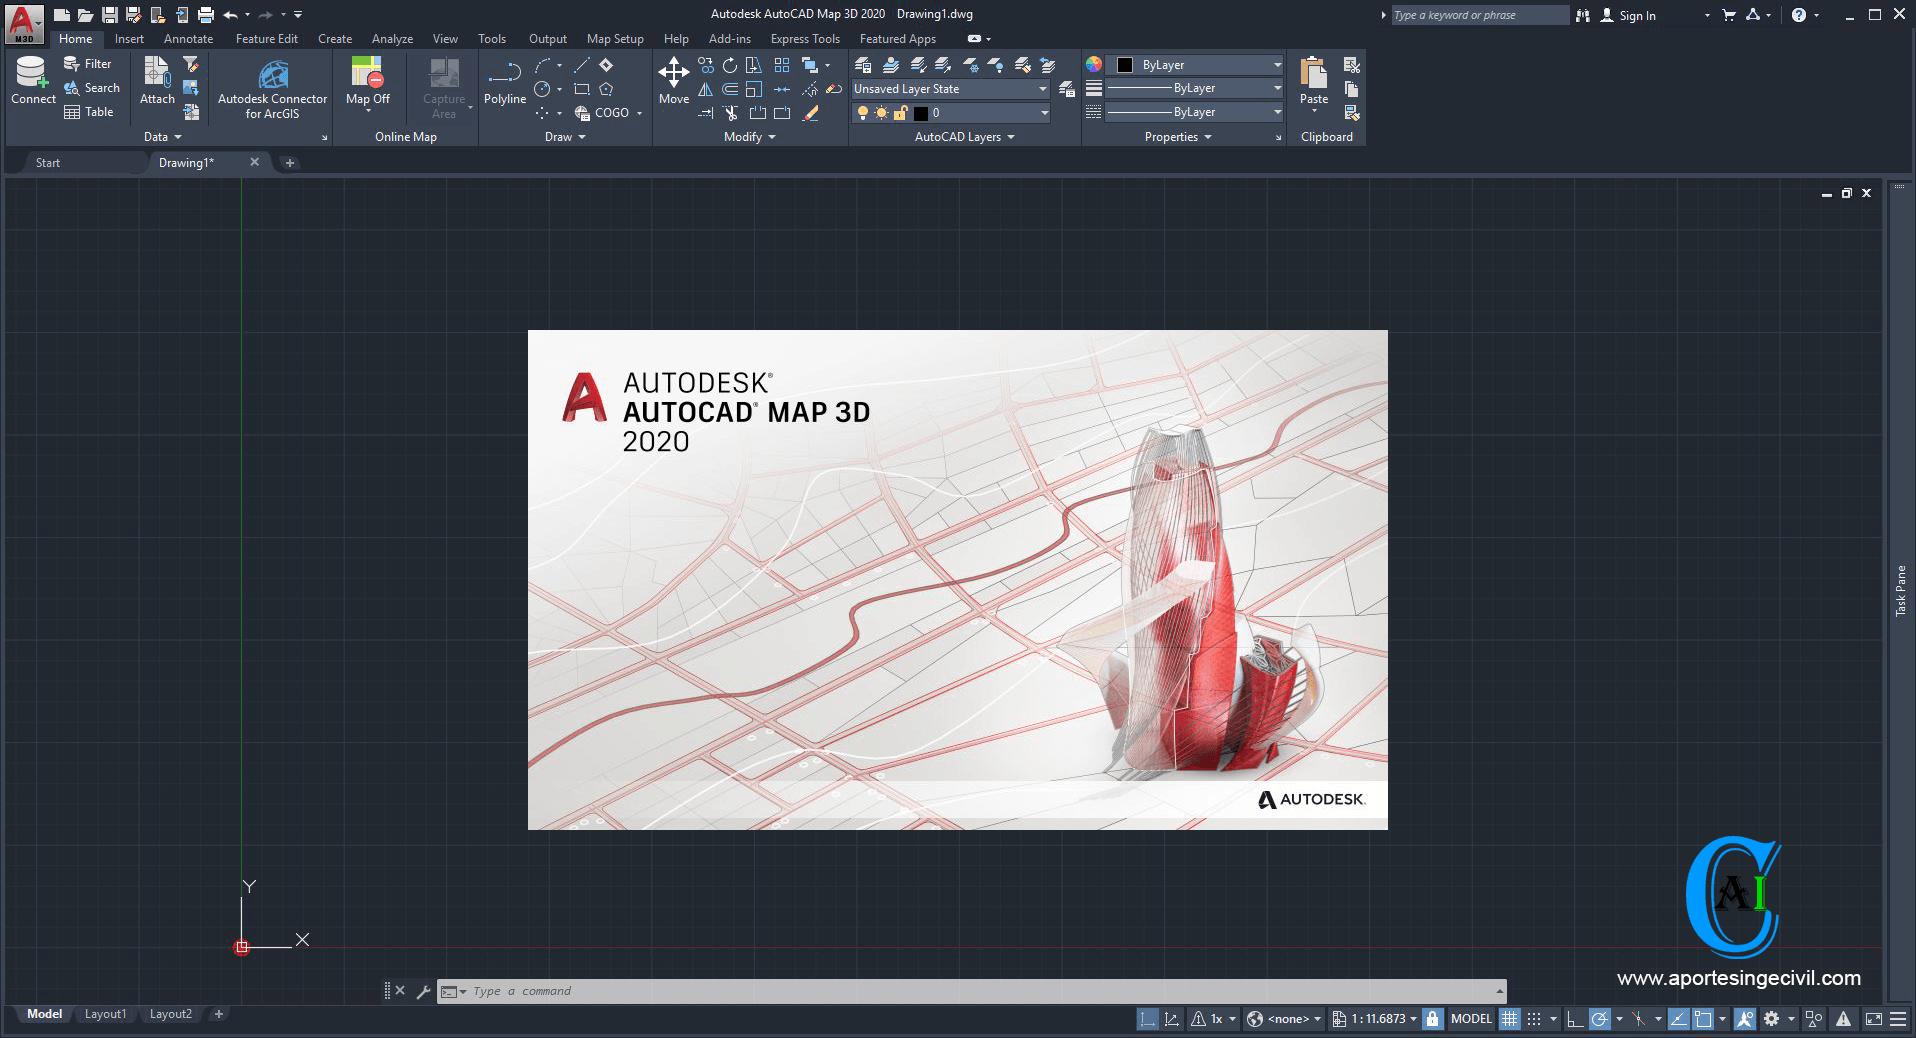 Autocad Map 3d 2020 En Español E Ingles